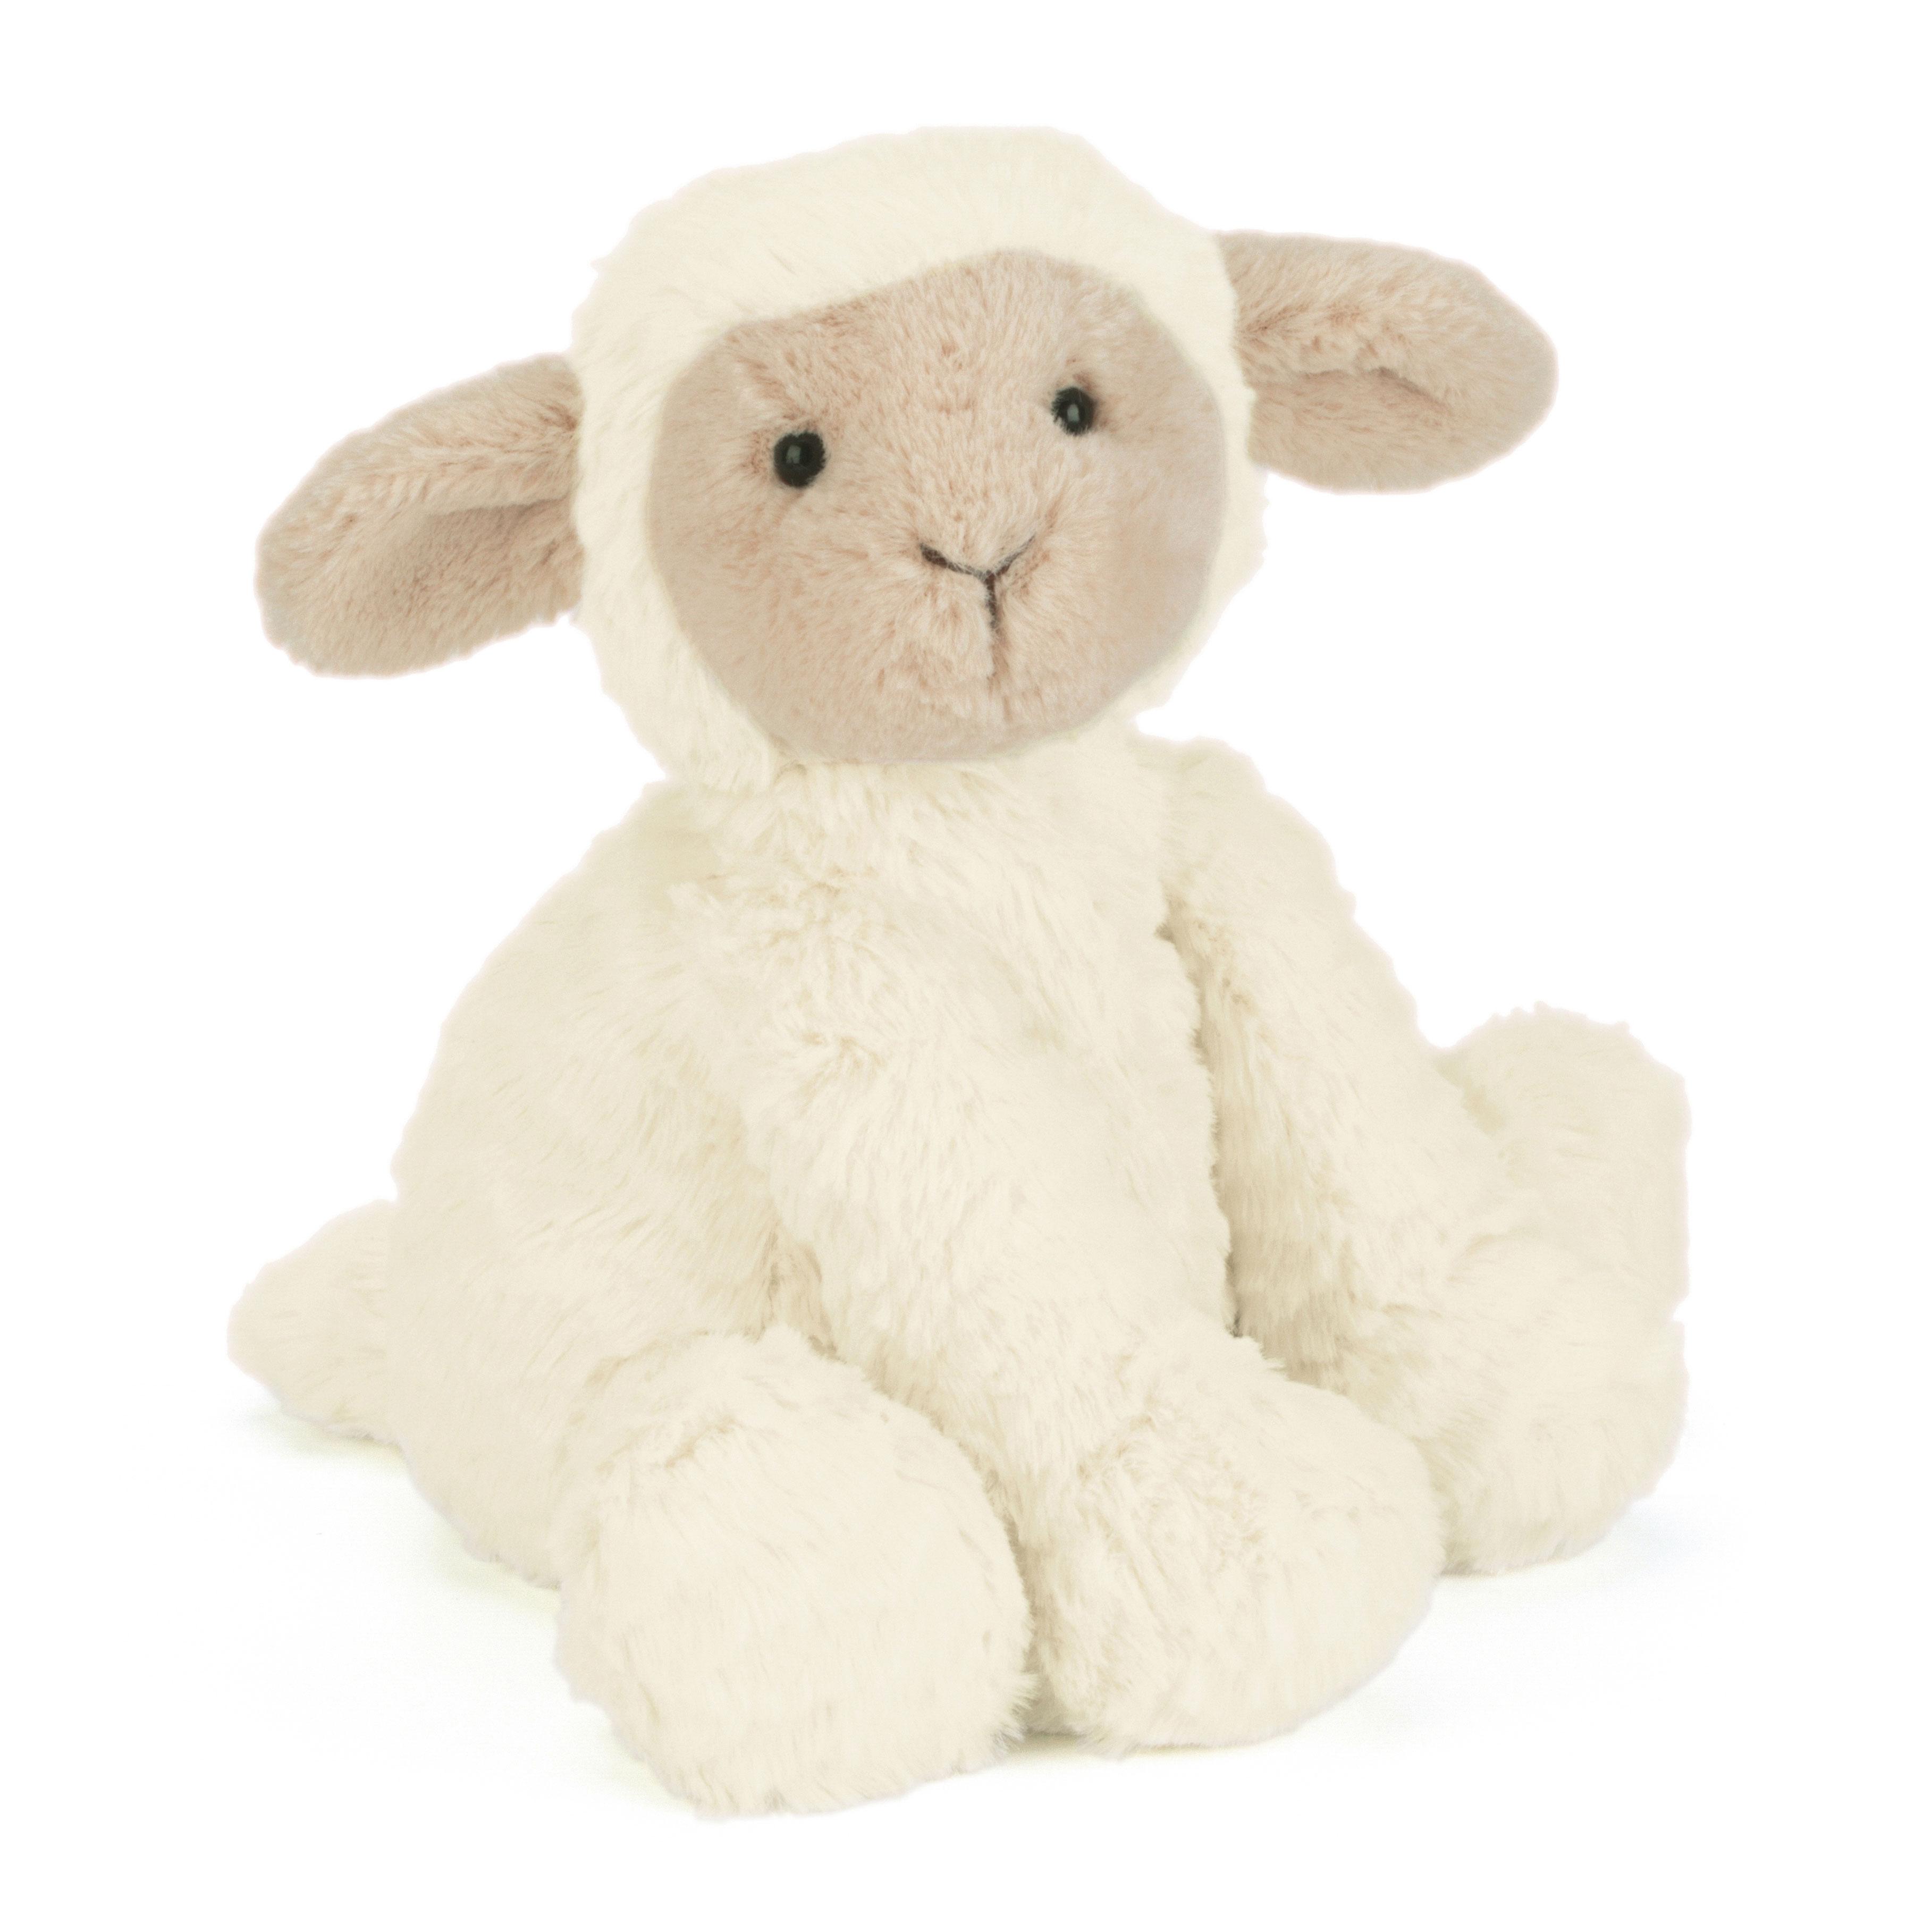 Jellycat Fuddlewuddle Lamb Medium in white - 23 cm